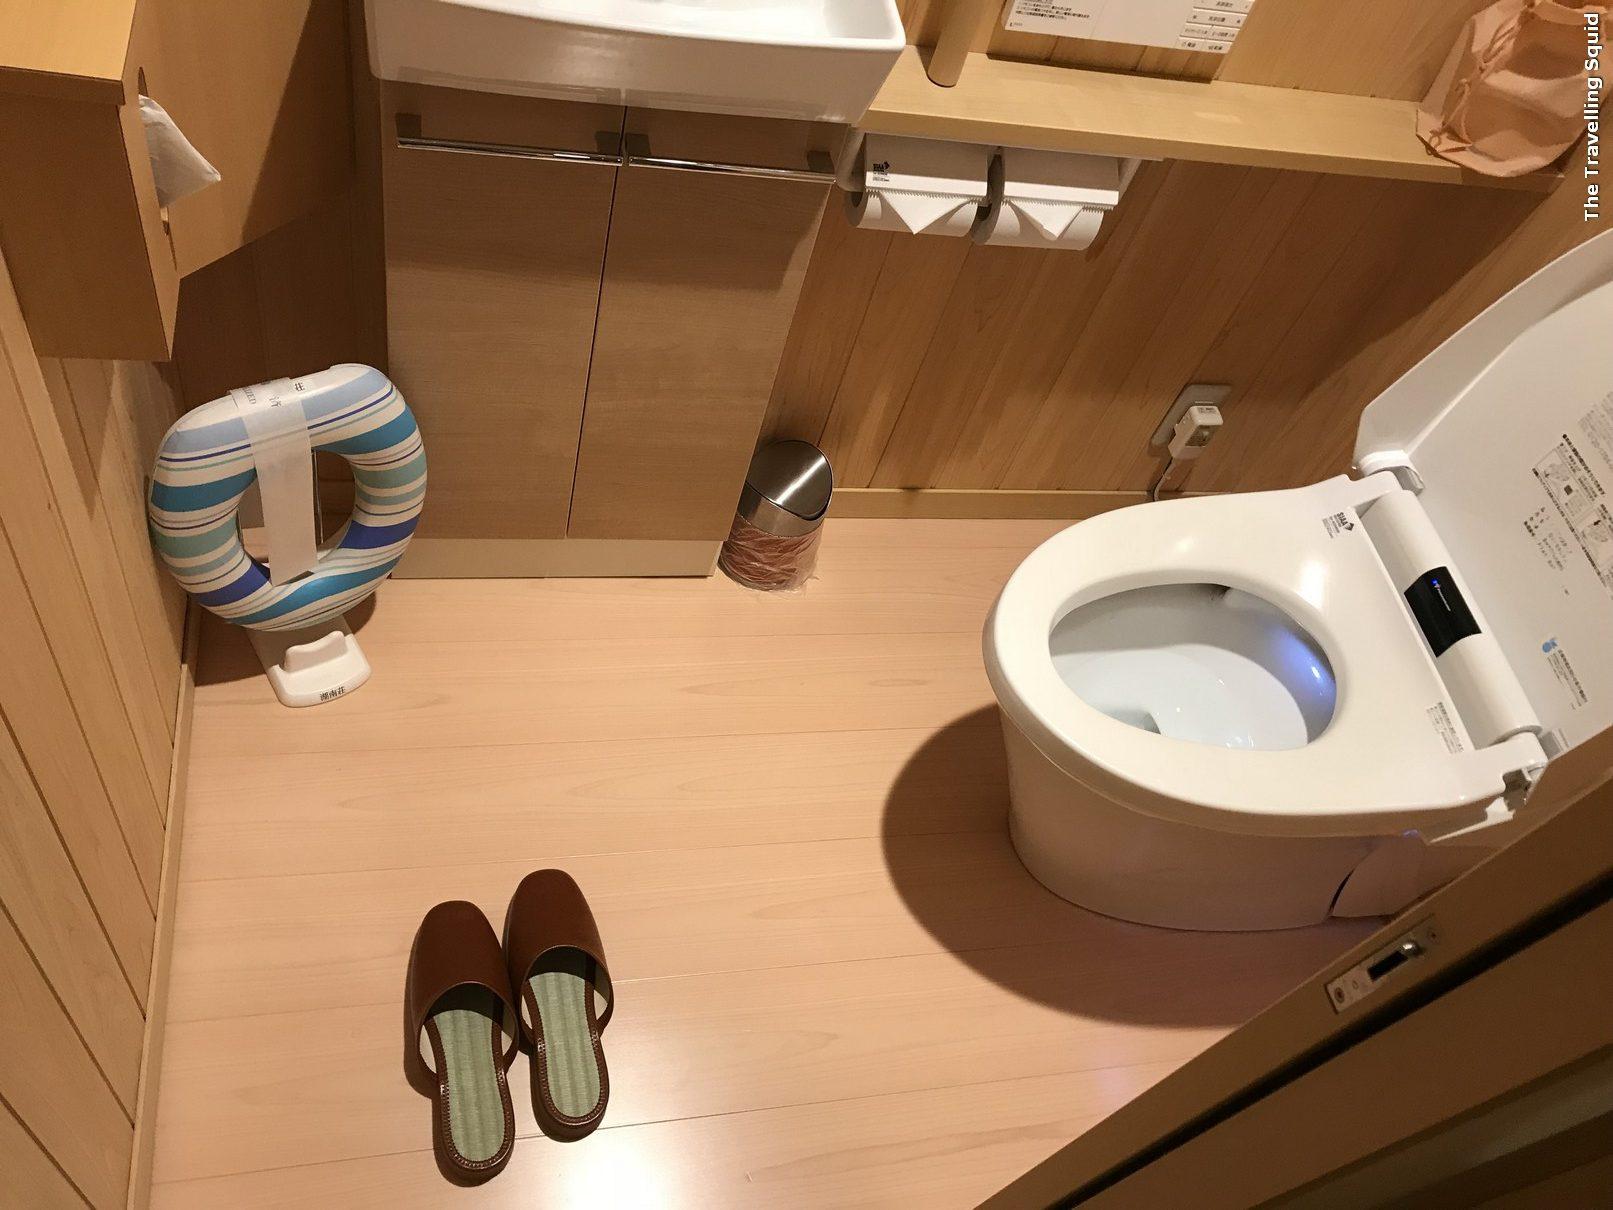 Hotel Konanso Fuji Kawaguchiko ryokan toilet toilet